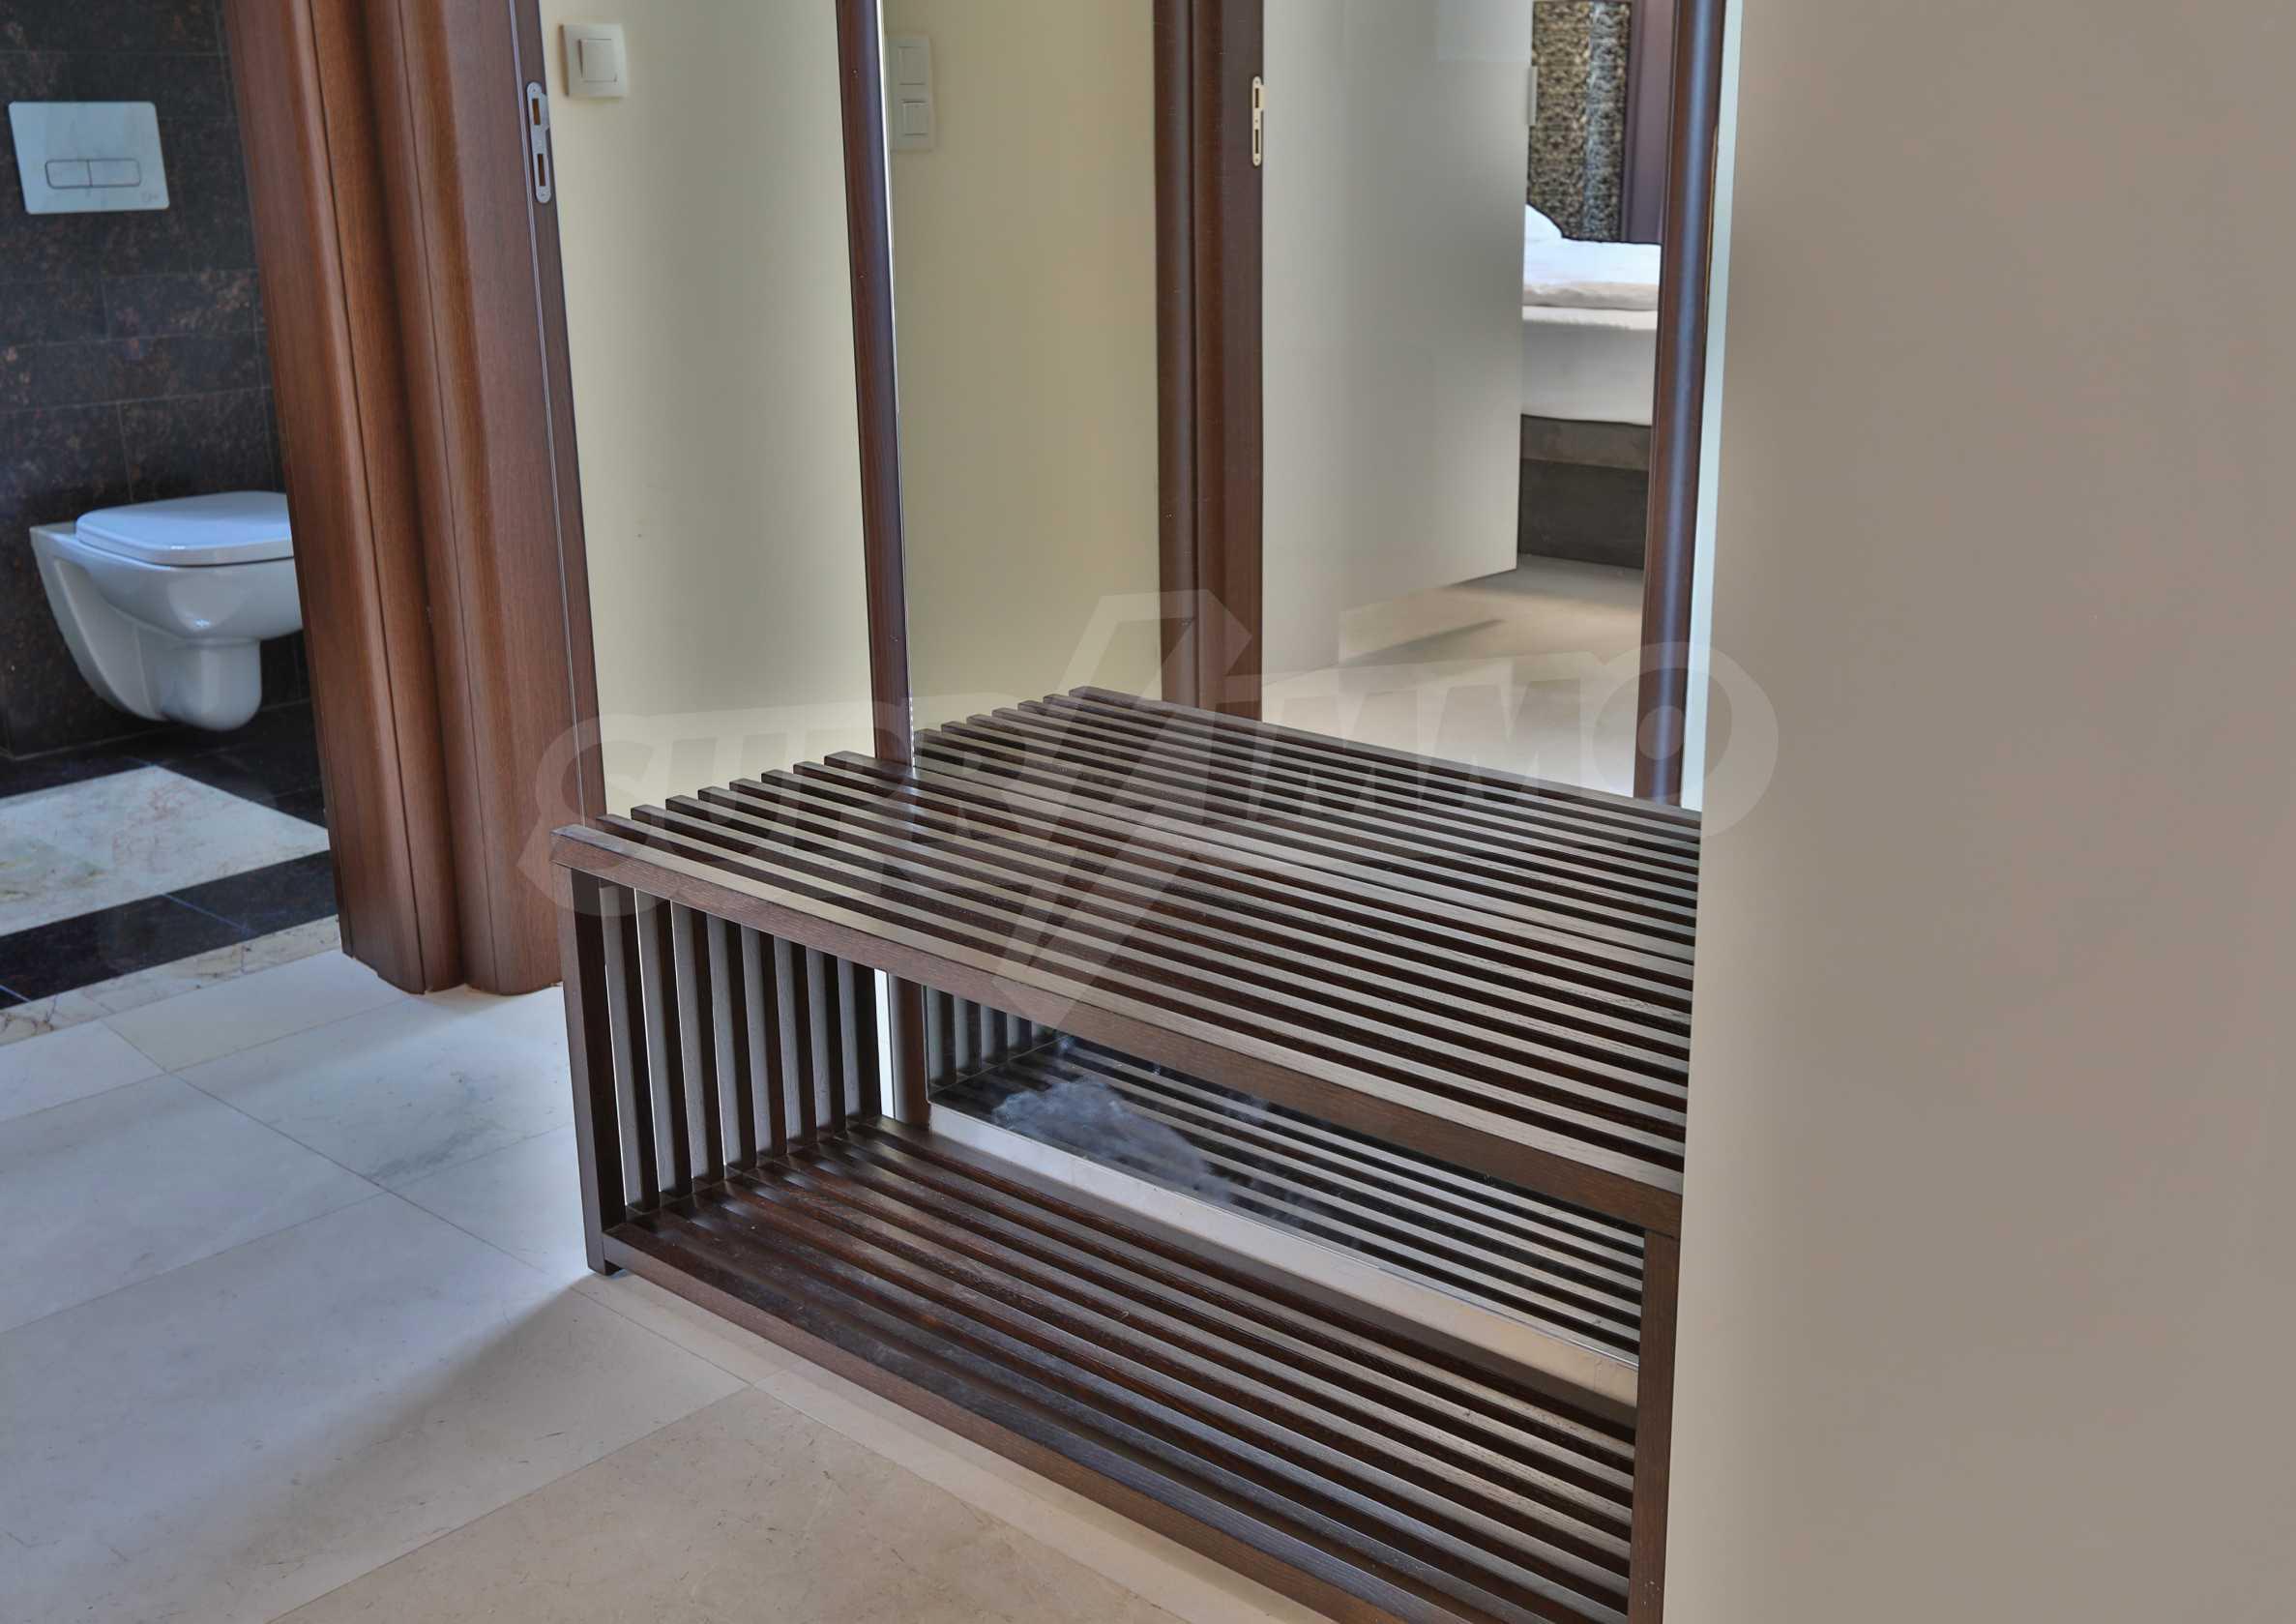 Exclusive 2-bedroom beachfront apartment in the prestigious Belle Époque Beach Residence 28